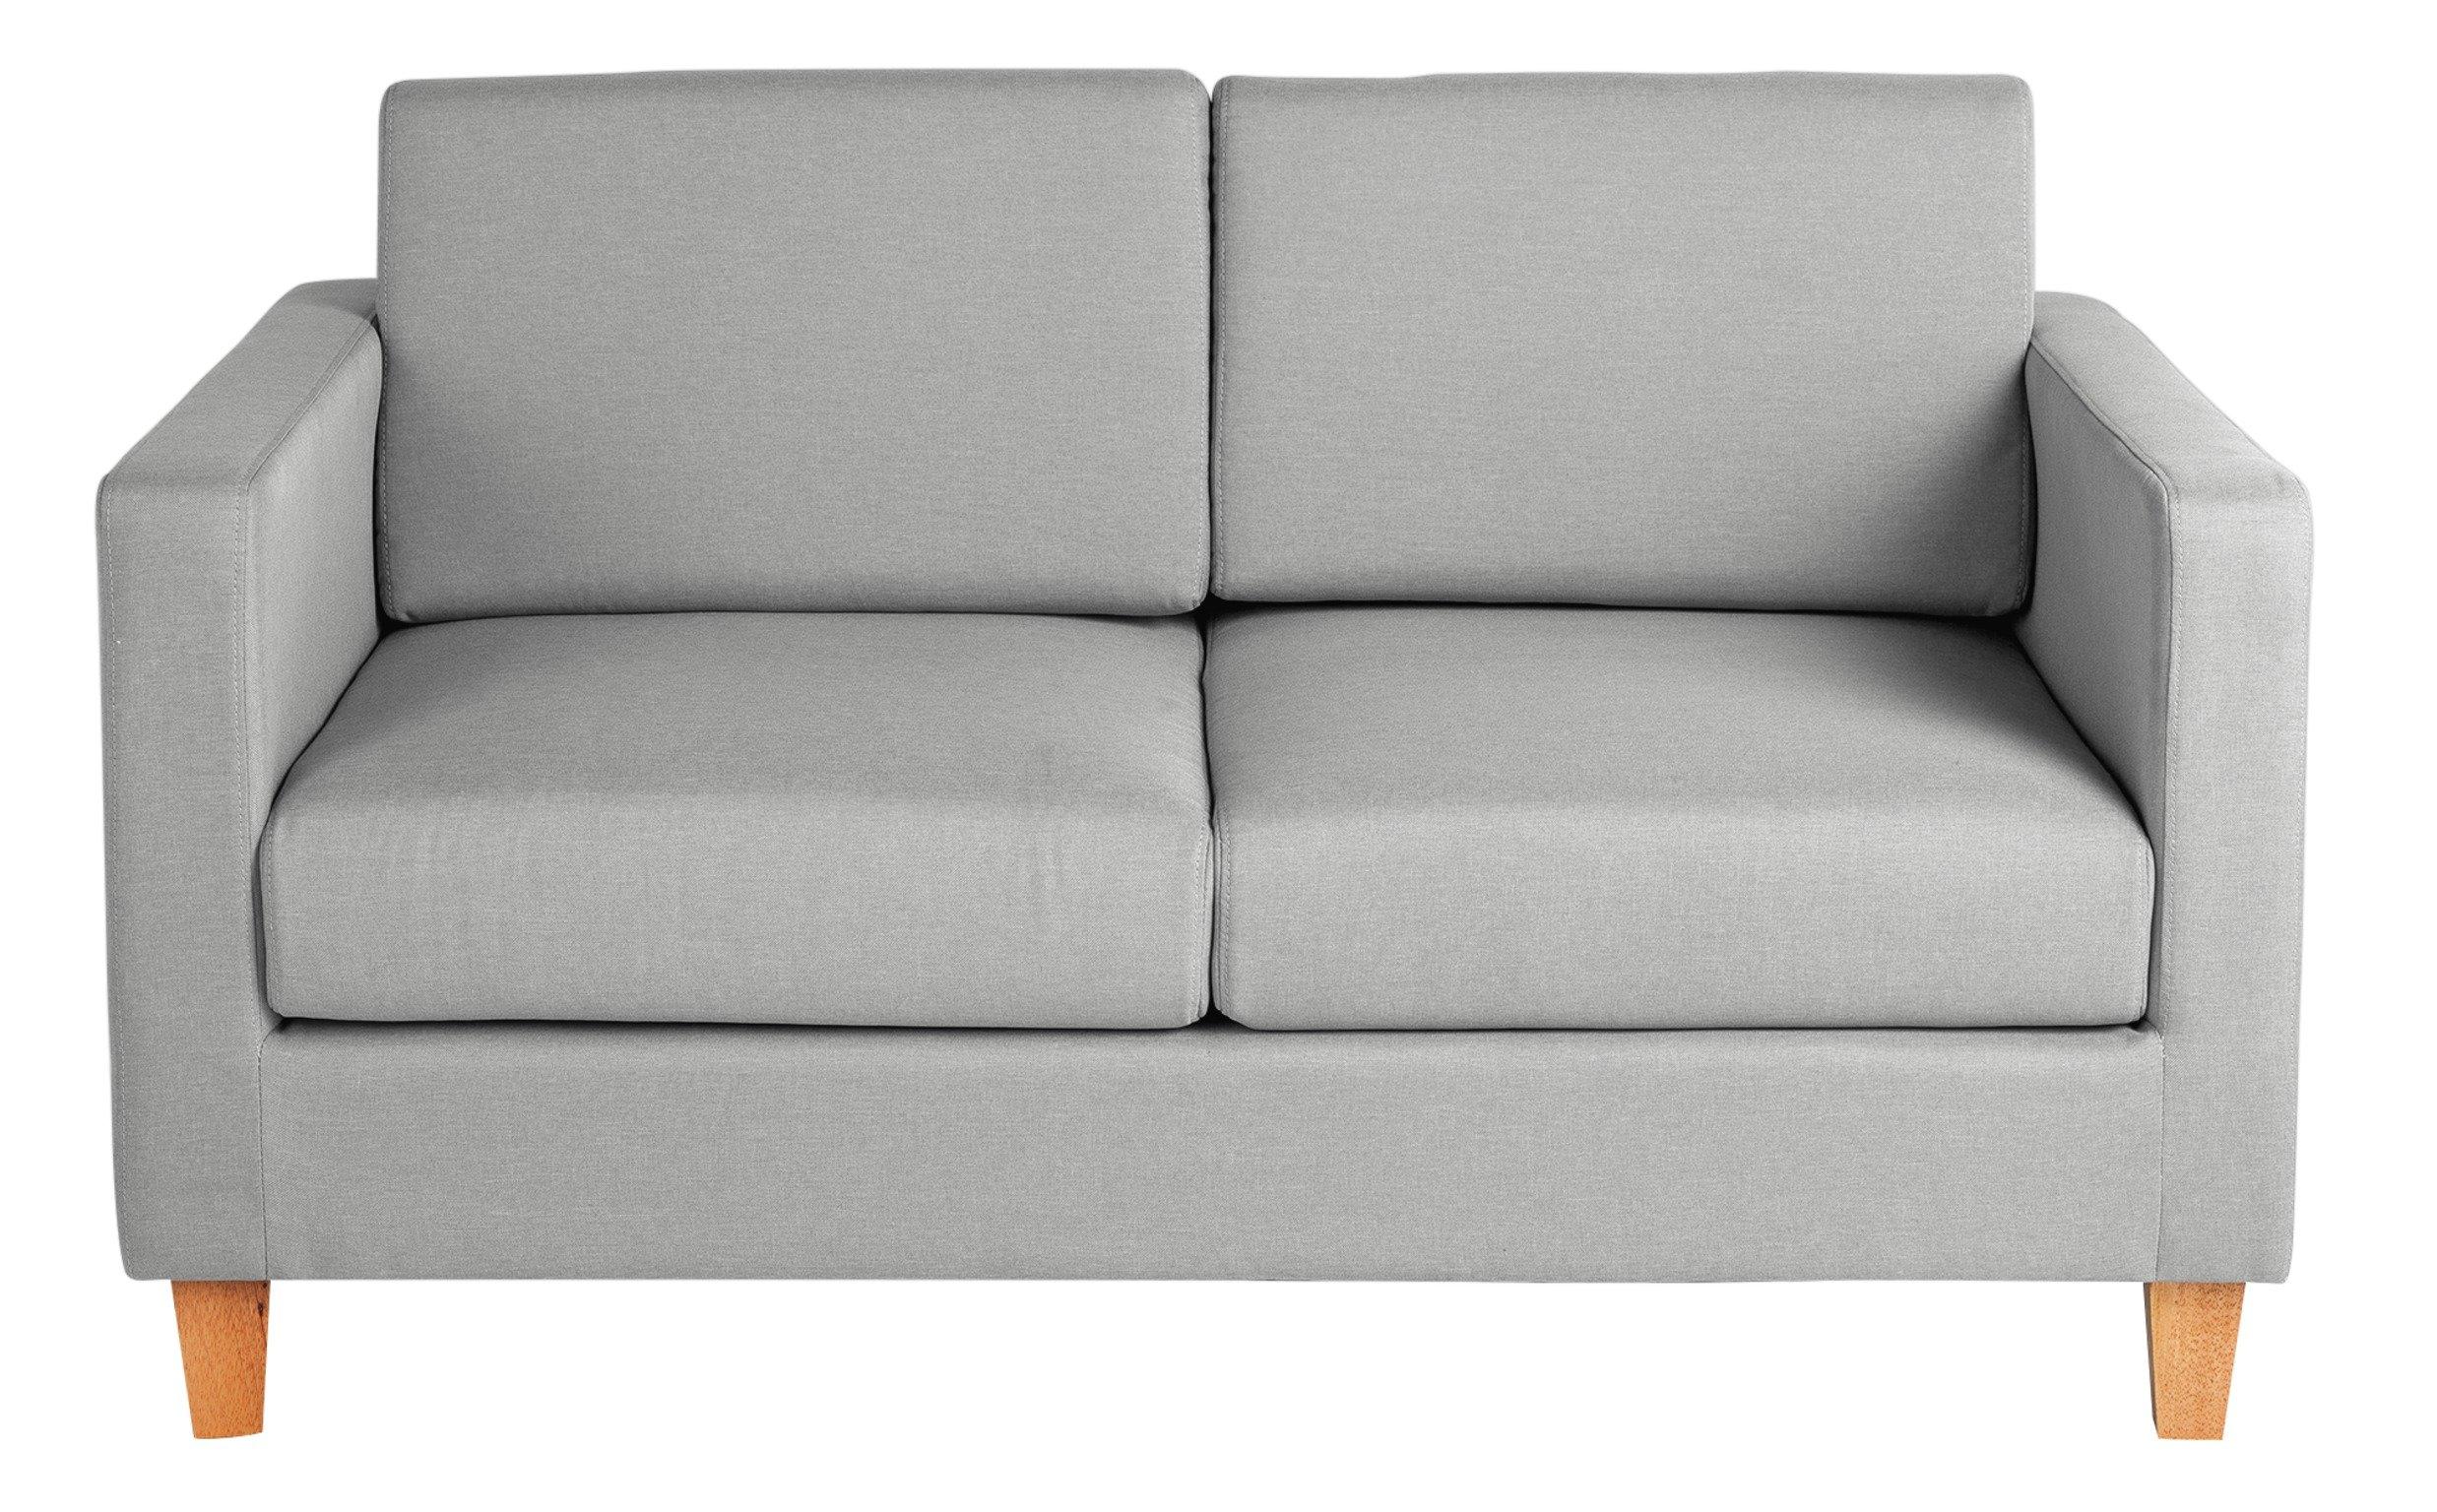 Argos Home Rosie 2 Seater Fabric Sofa - Light Grey